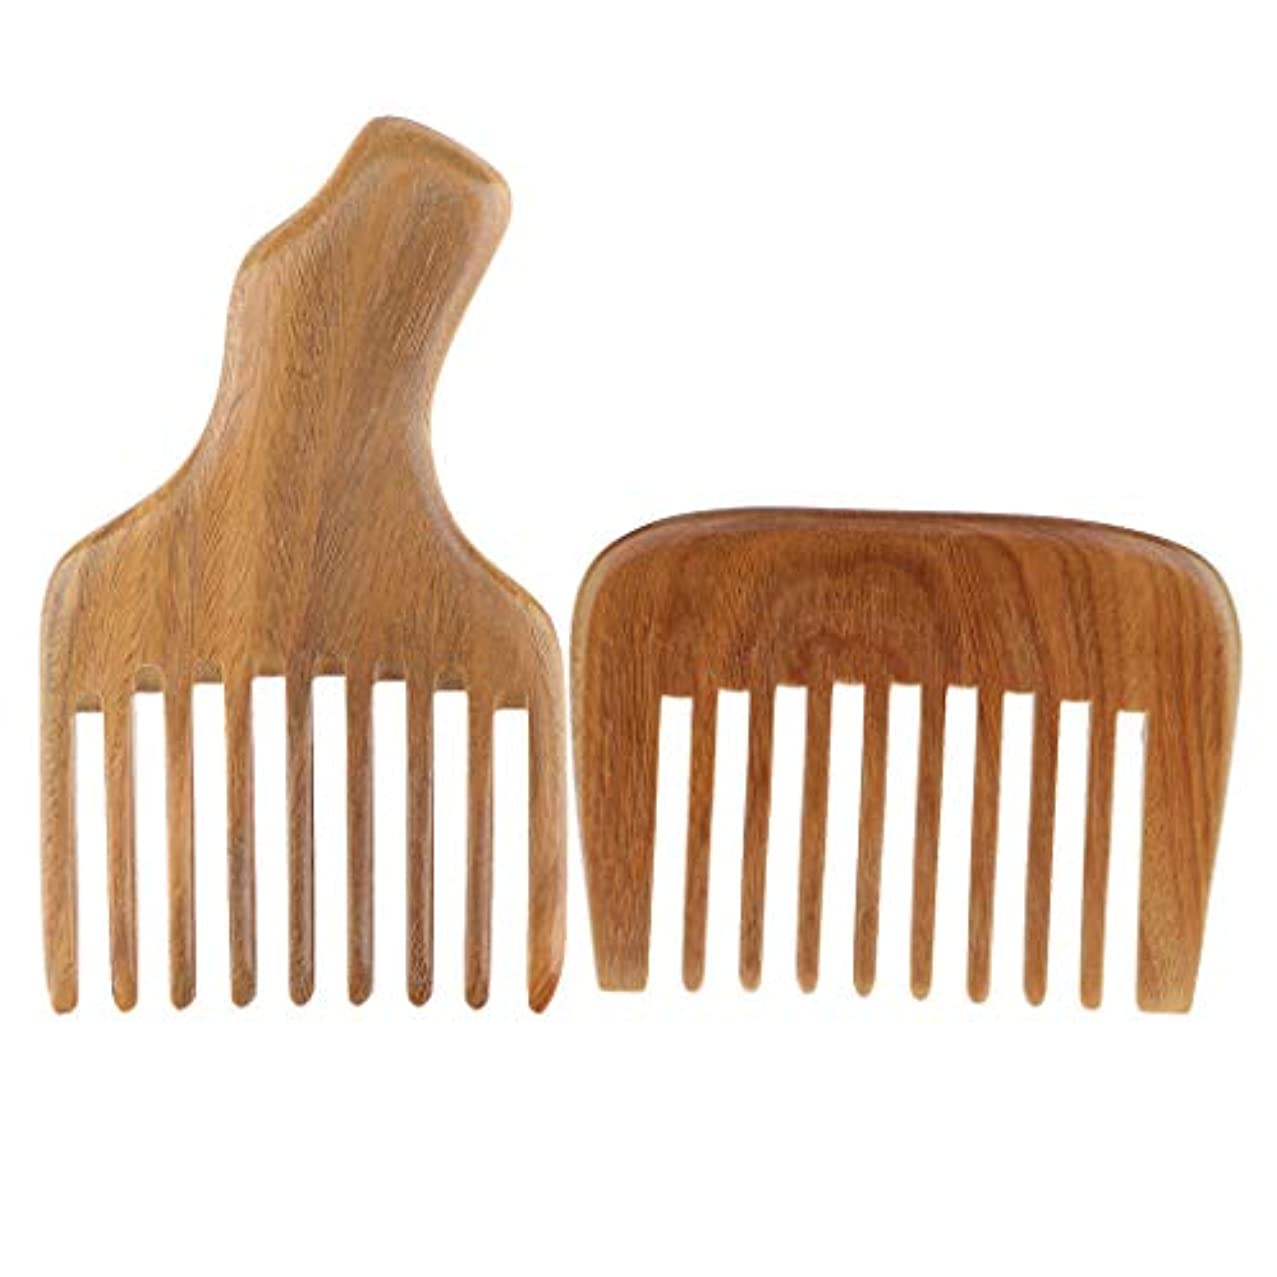 DYNWAVE ウッドコーム 天然木の櫛セット 髪のマッサージの櫛 2個セット